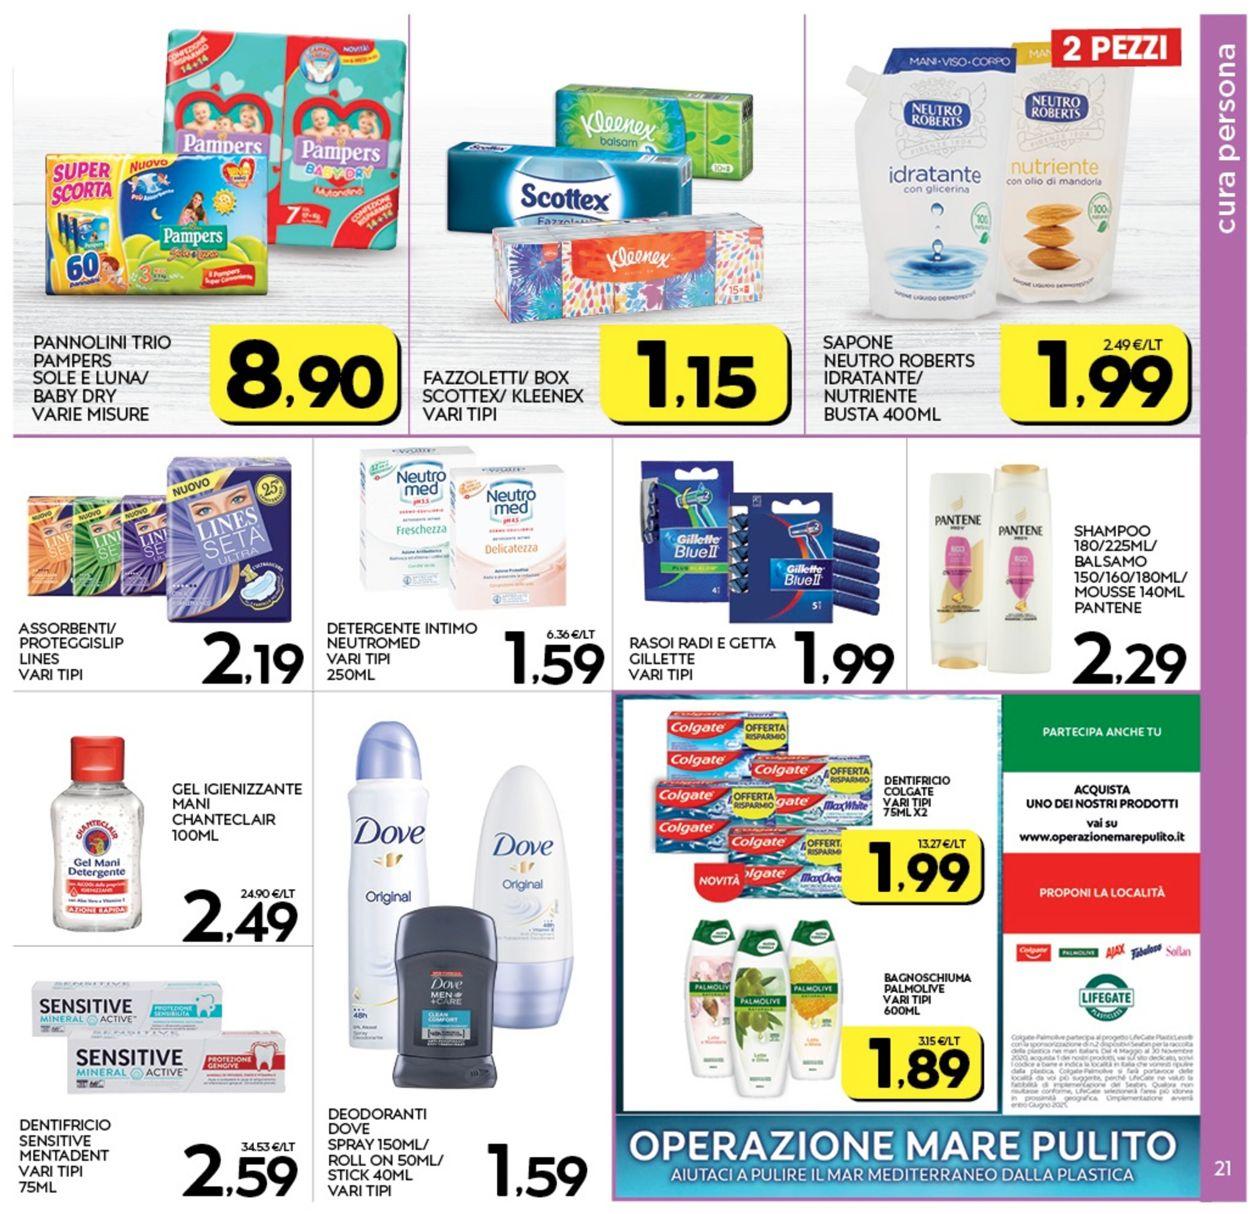 Volantino Interspar - Offerte 05/08-16/08/2020 (Pagina 21)